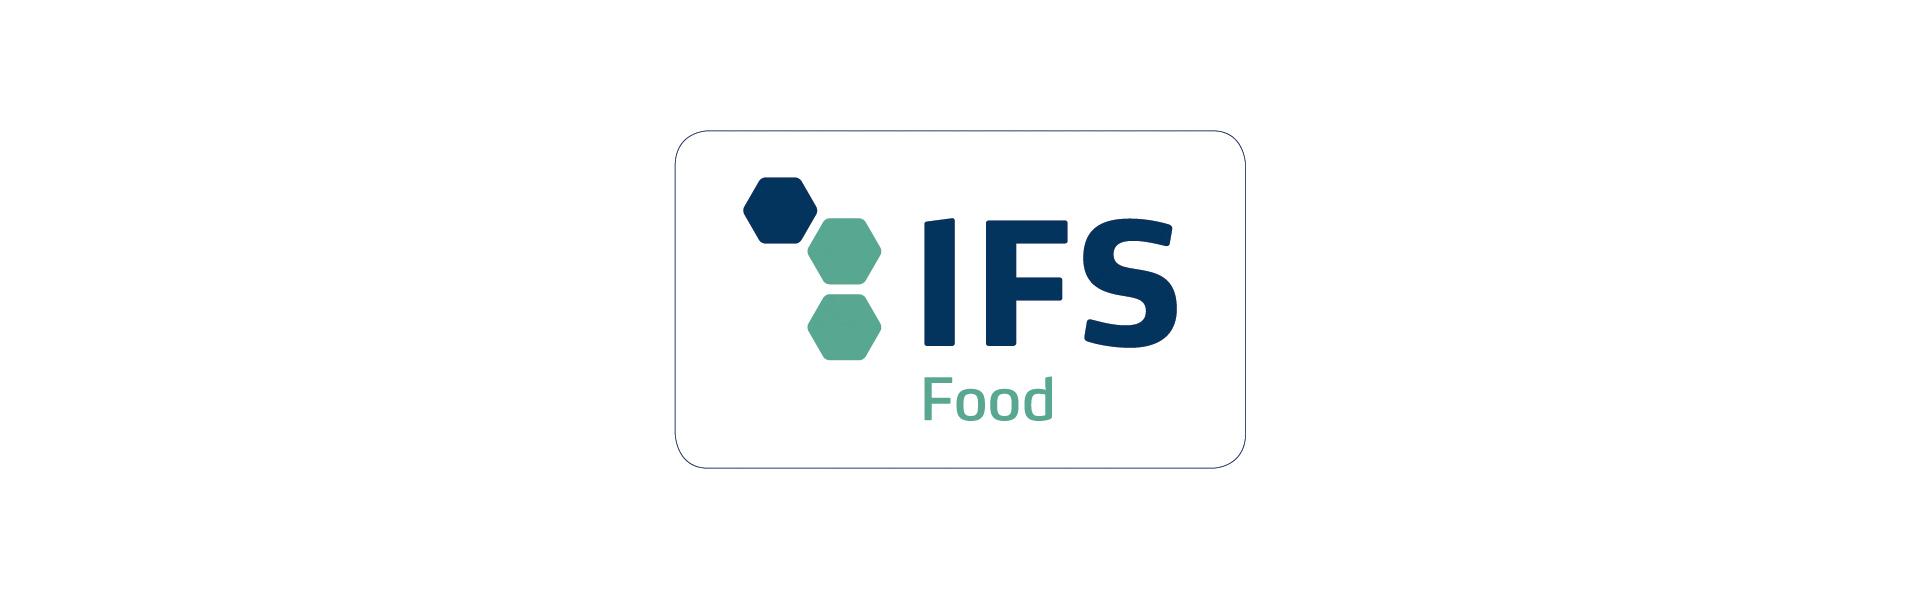 ifs01